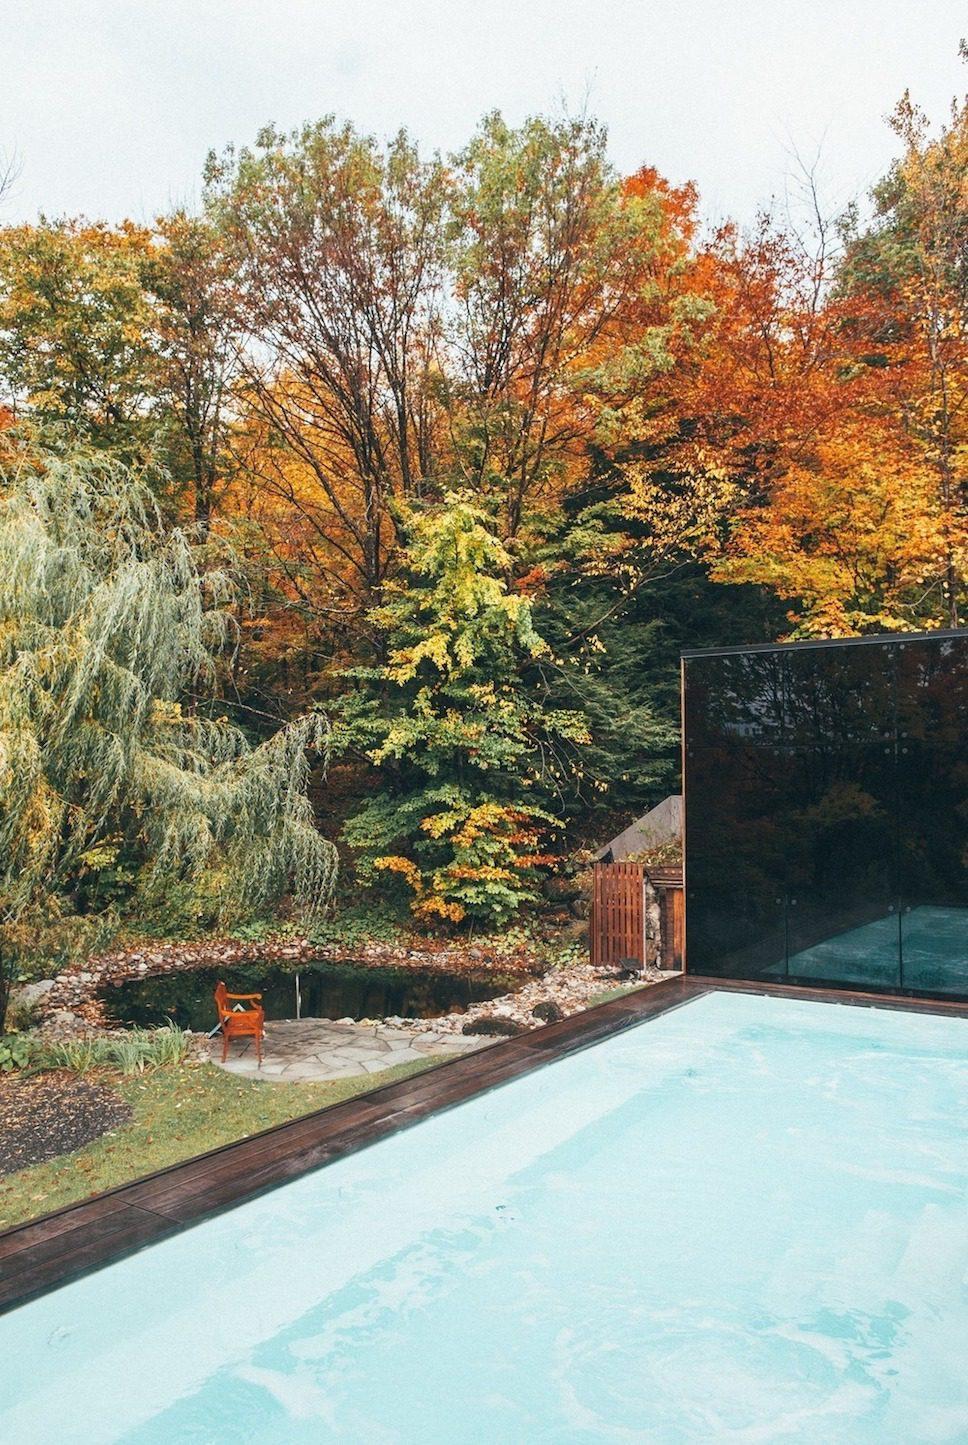 BALNEA spa + réserve thermale